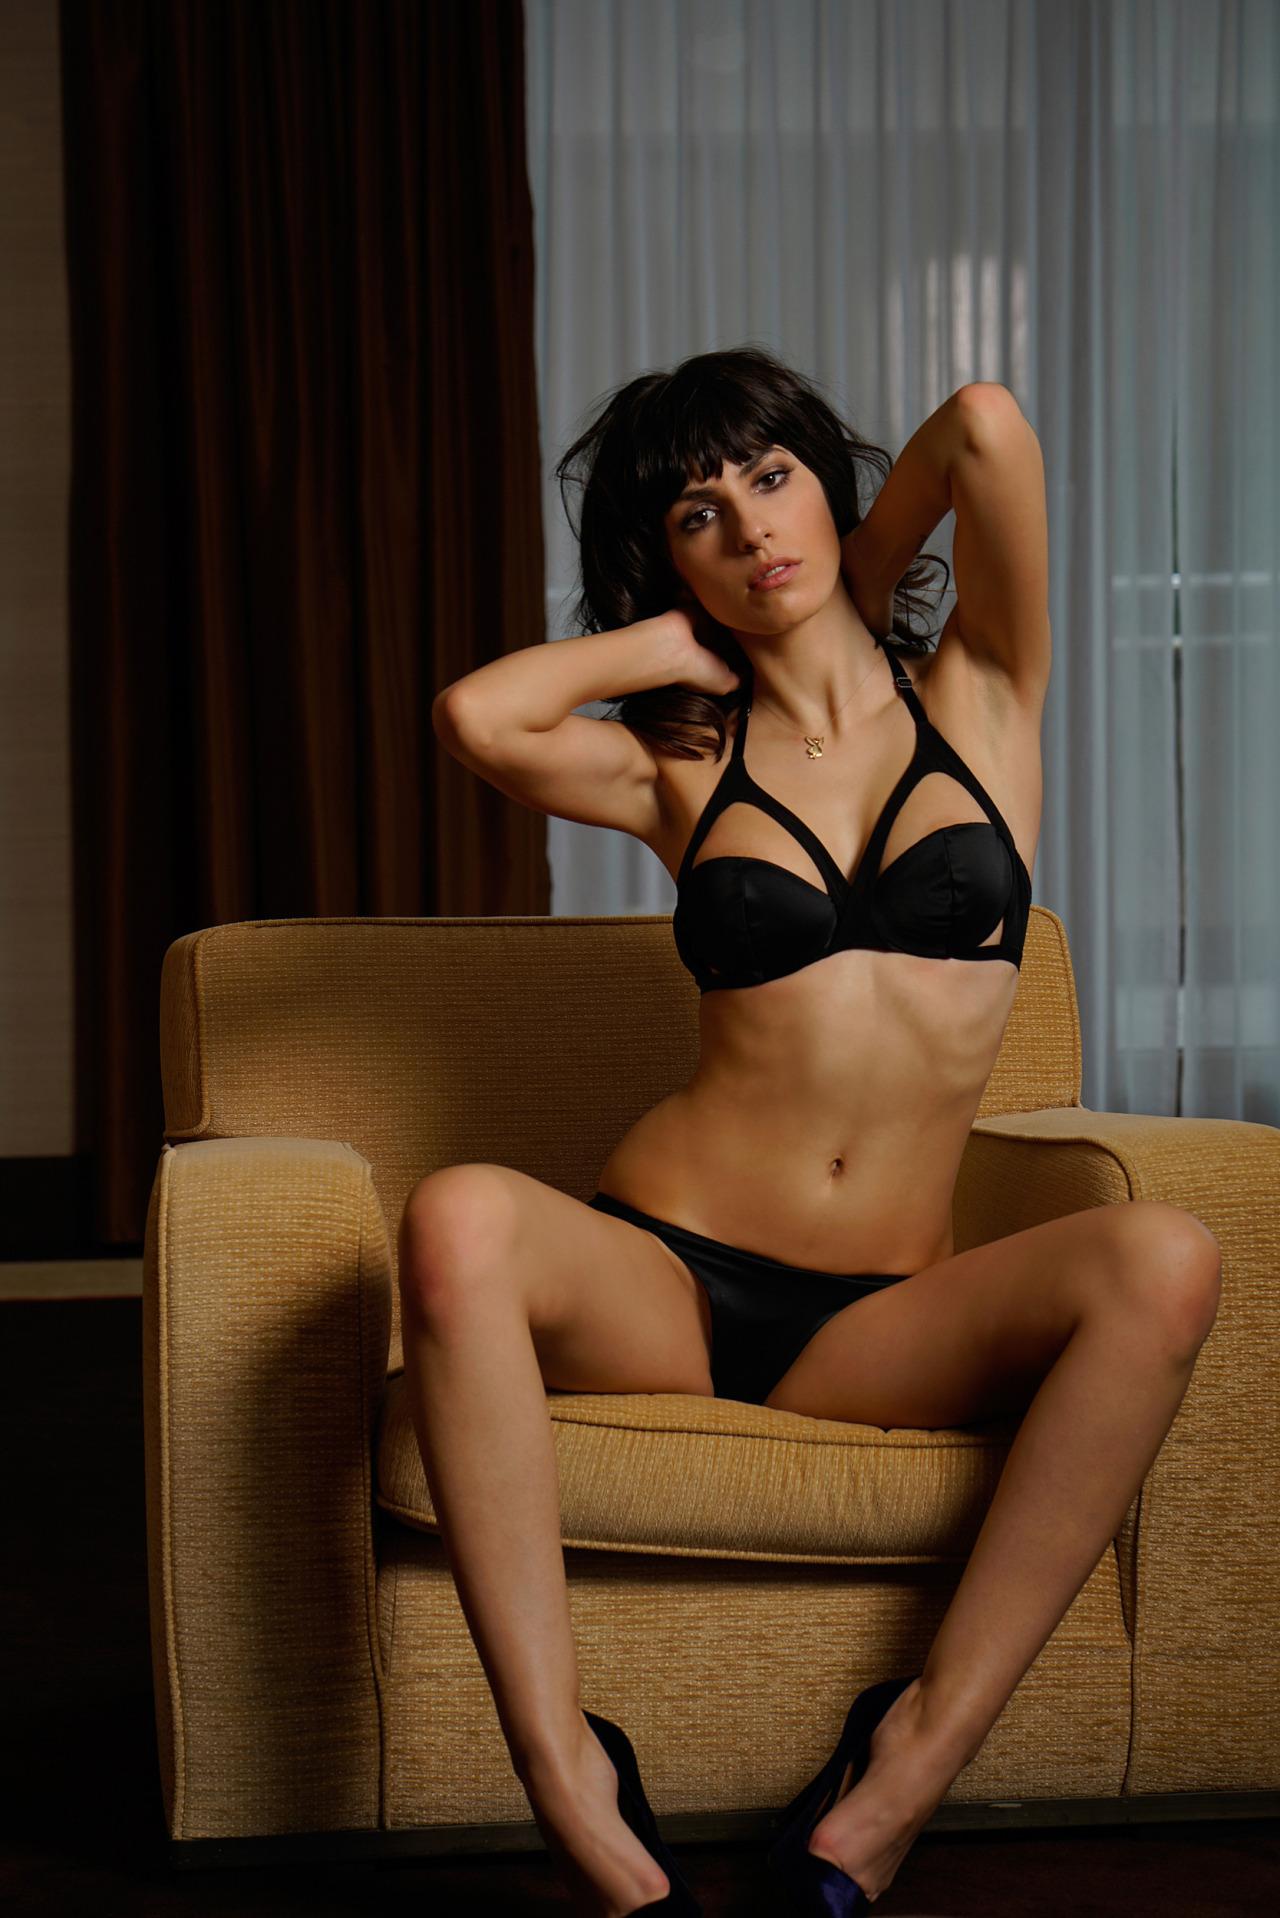 Jacqueline Sc R Playboyplus - Series 2 - Vanilla Babes